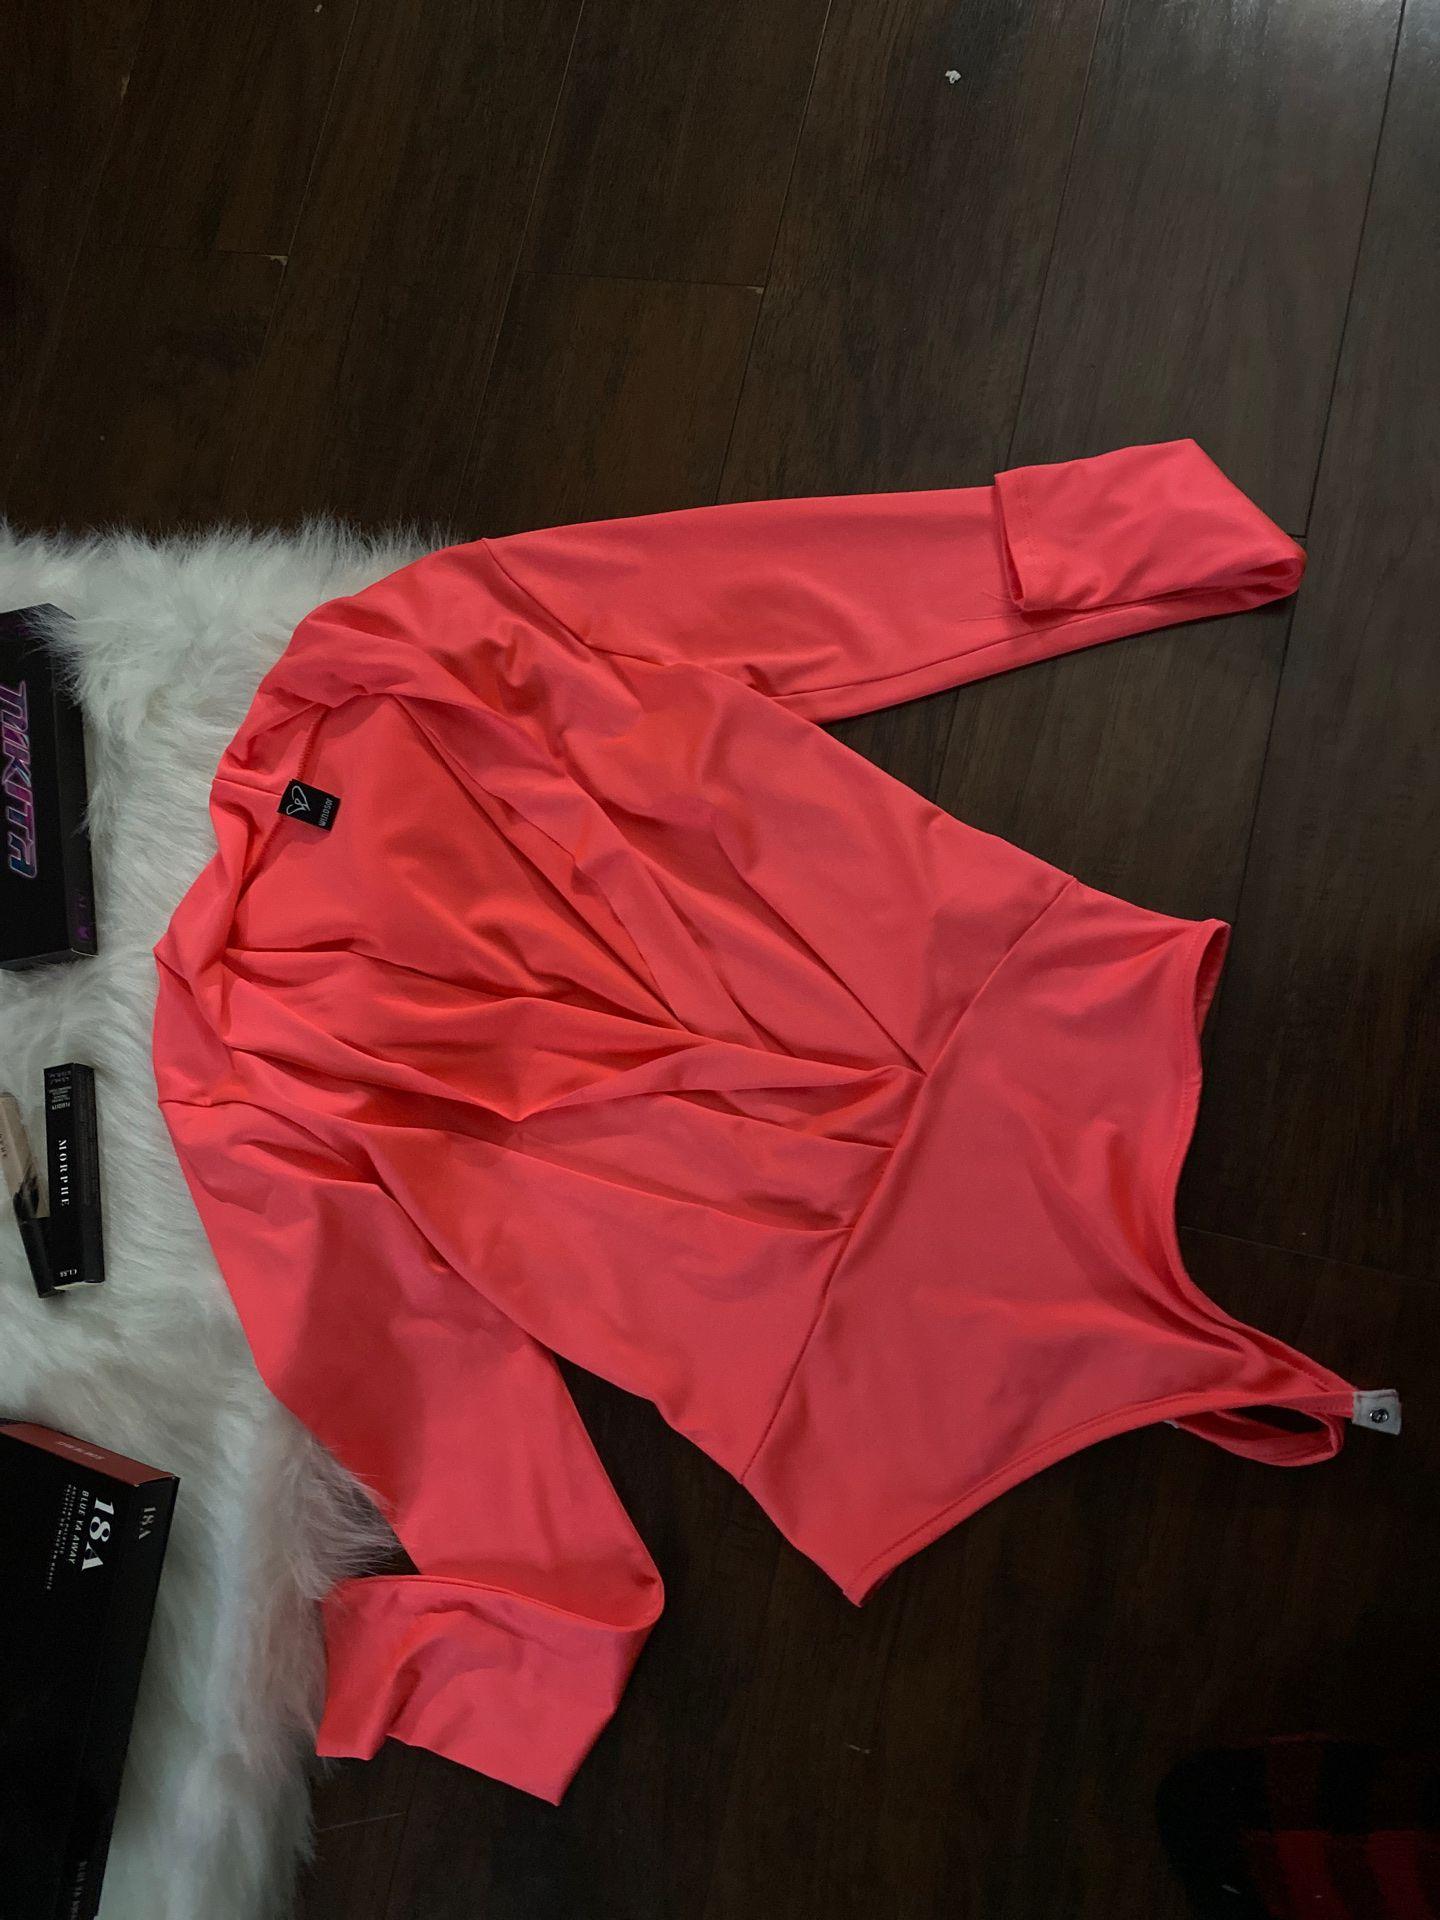 Women's bodysuit